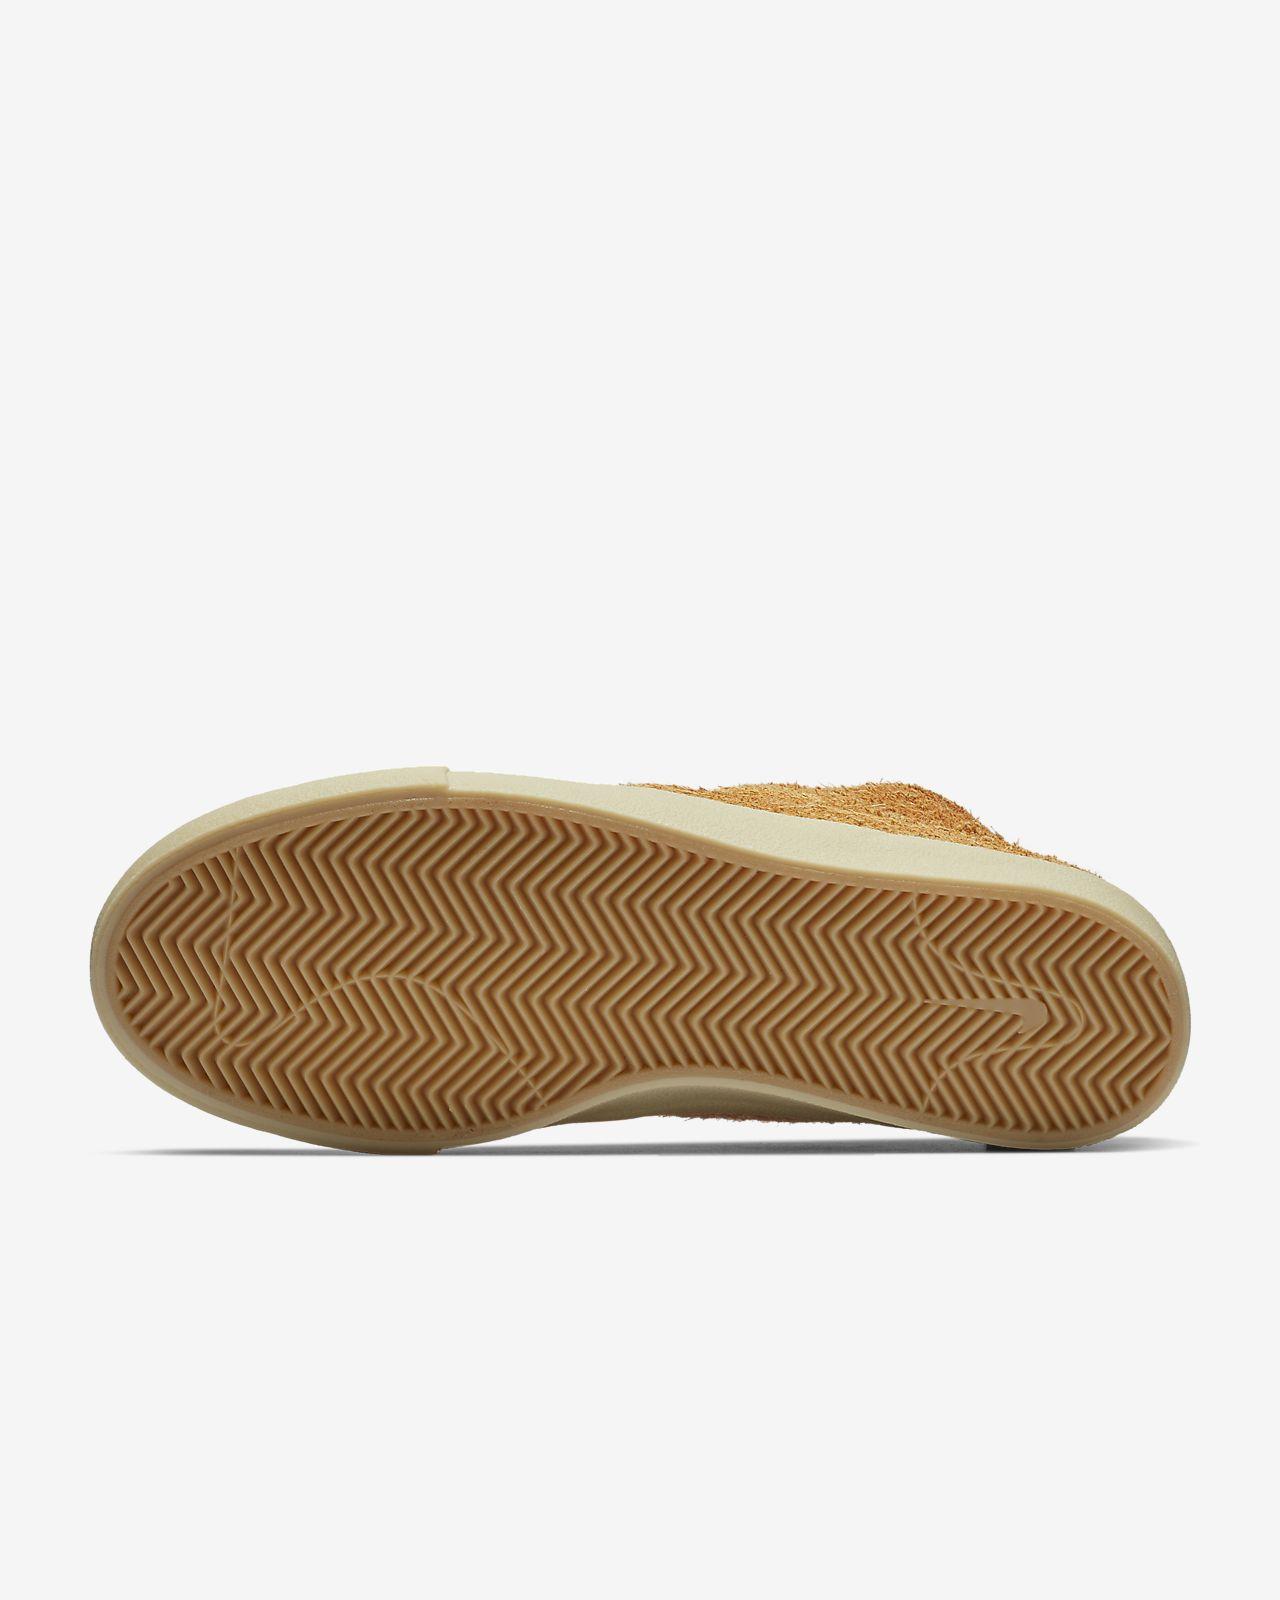 Calzado de skateboarding para hombre Nike SB Zoom Stefan Janoski Mid Crafted